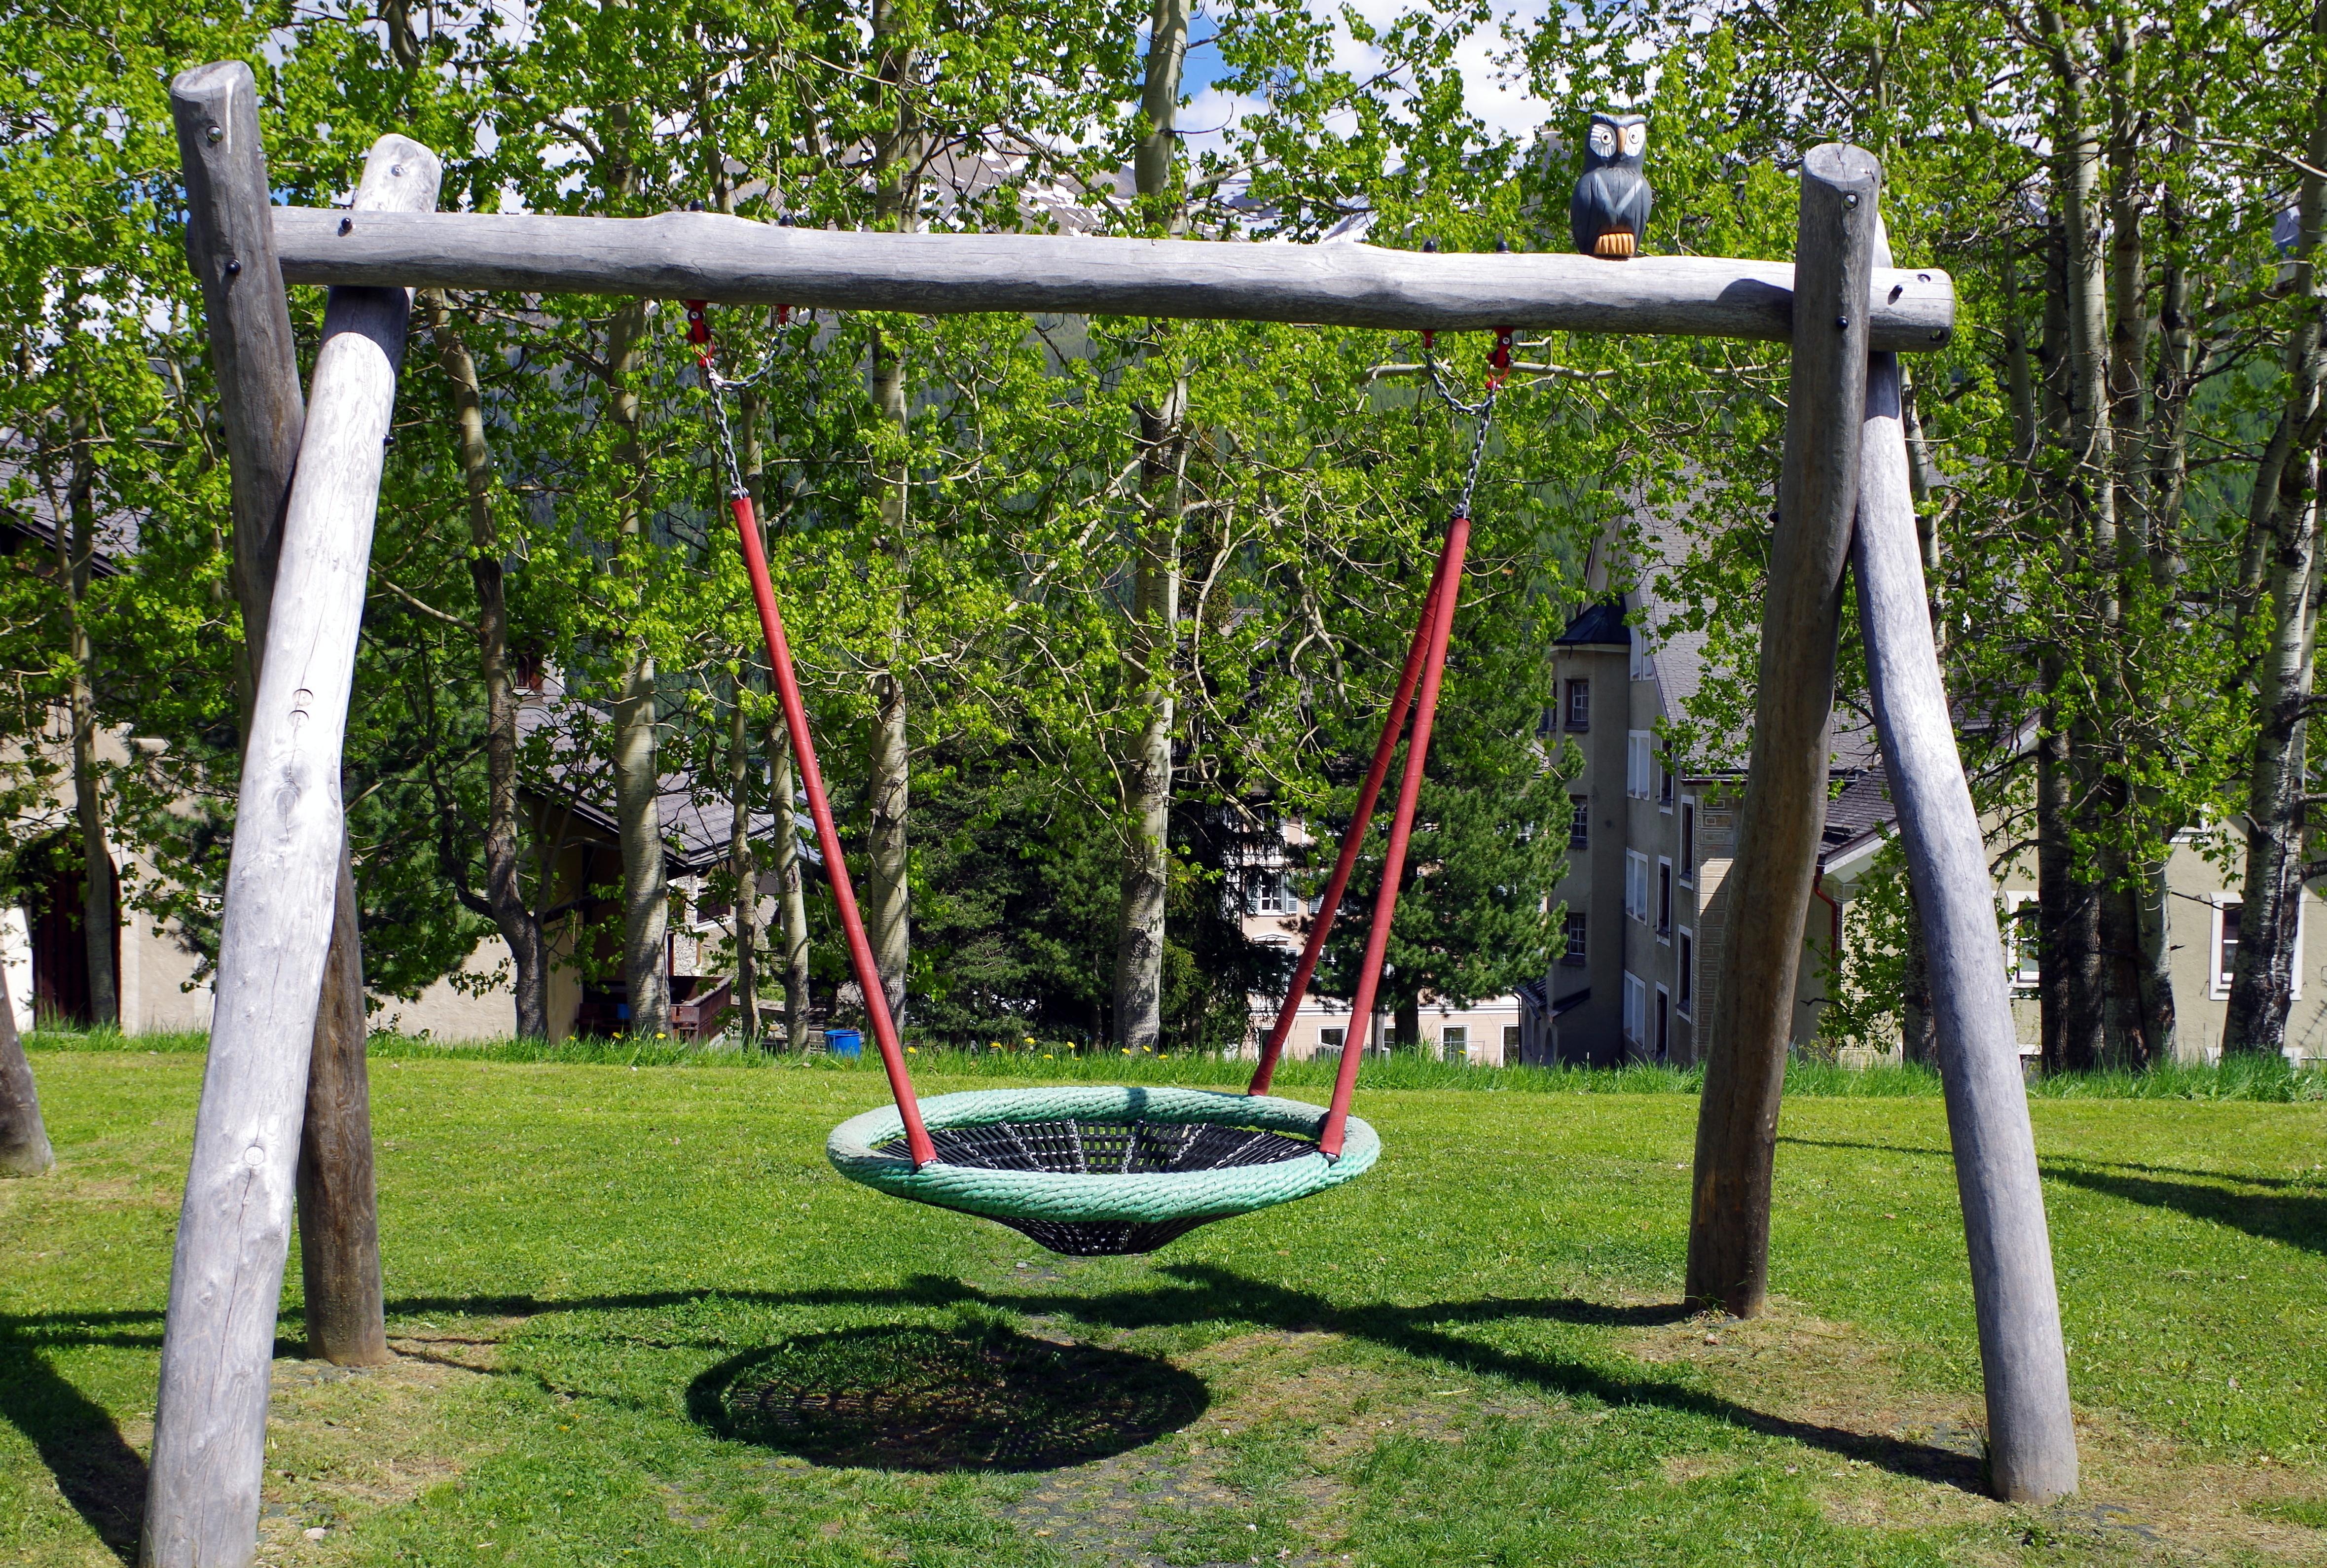 Kinderspielplatz Eulalia Slide 5